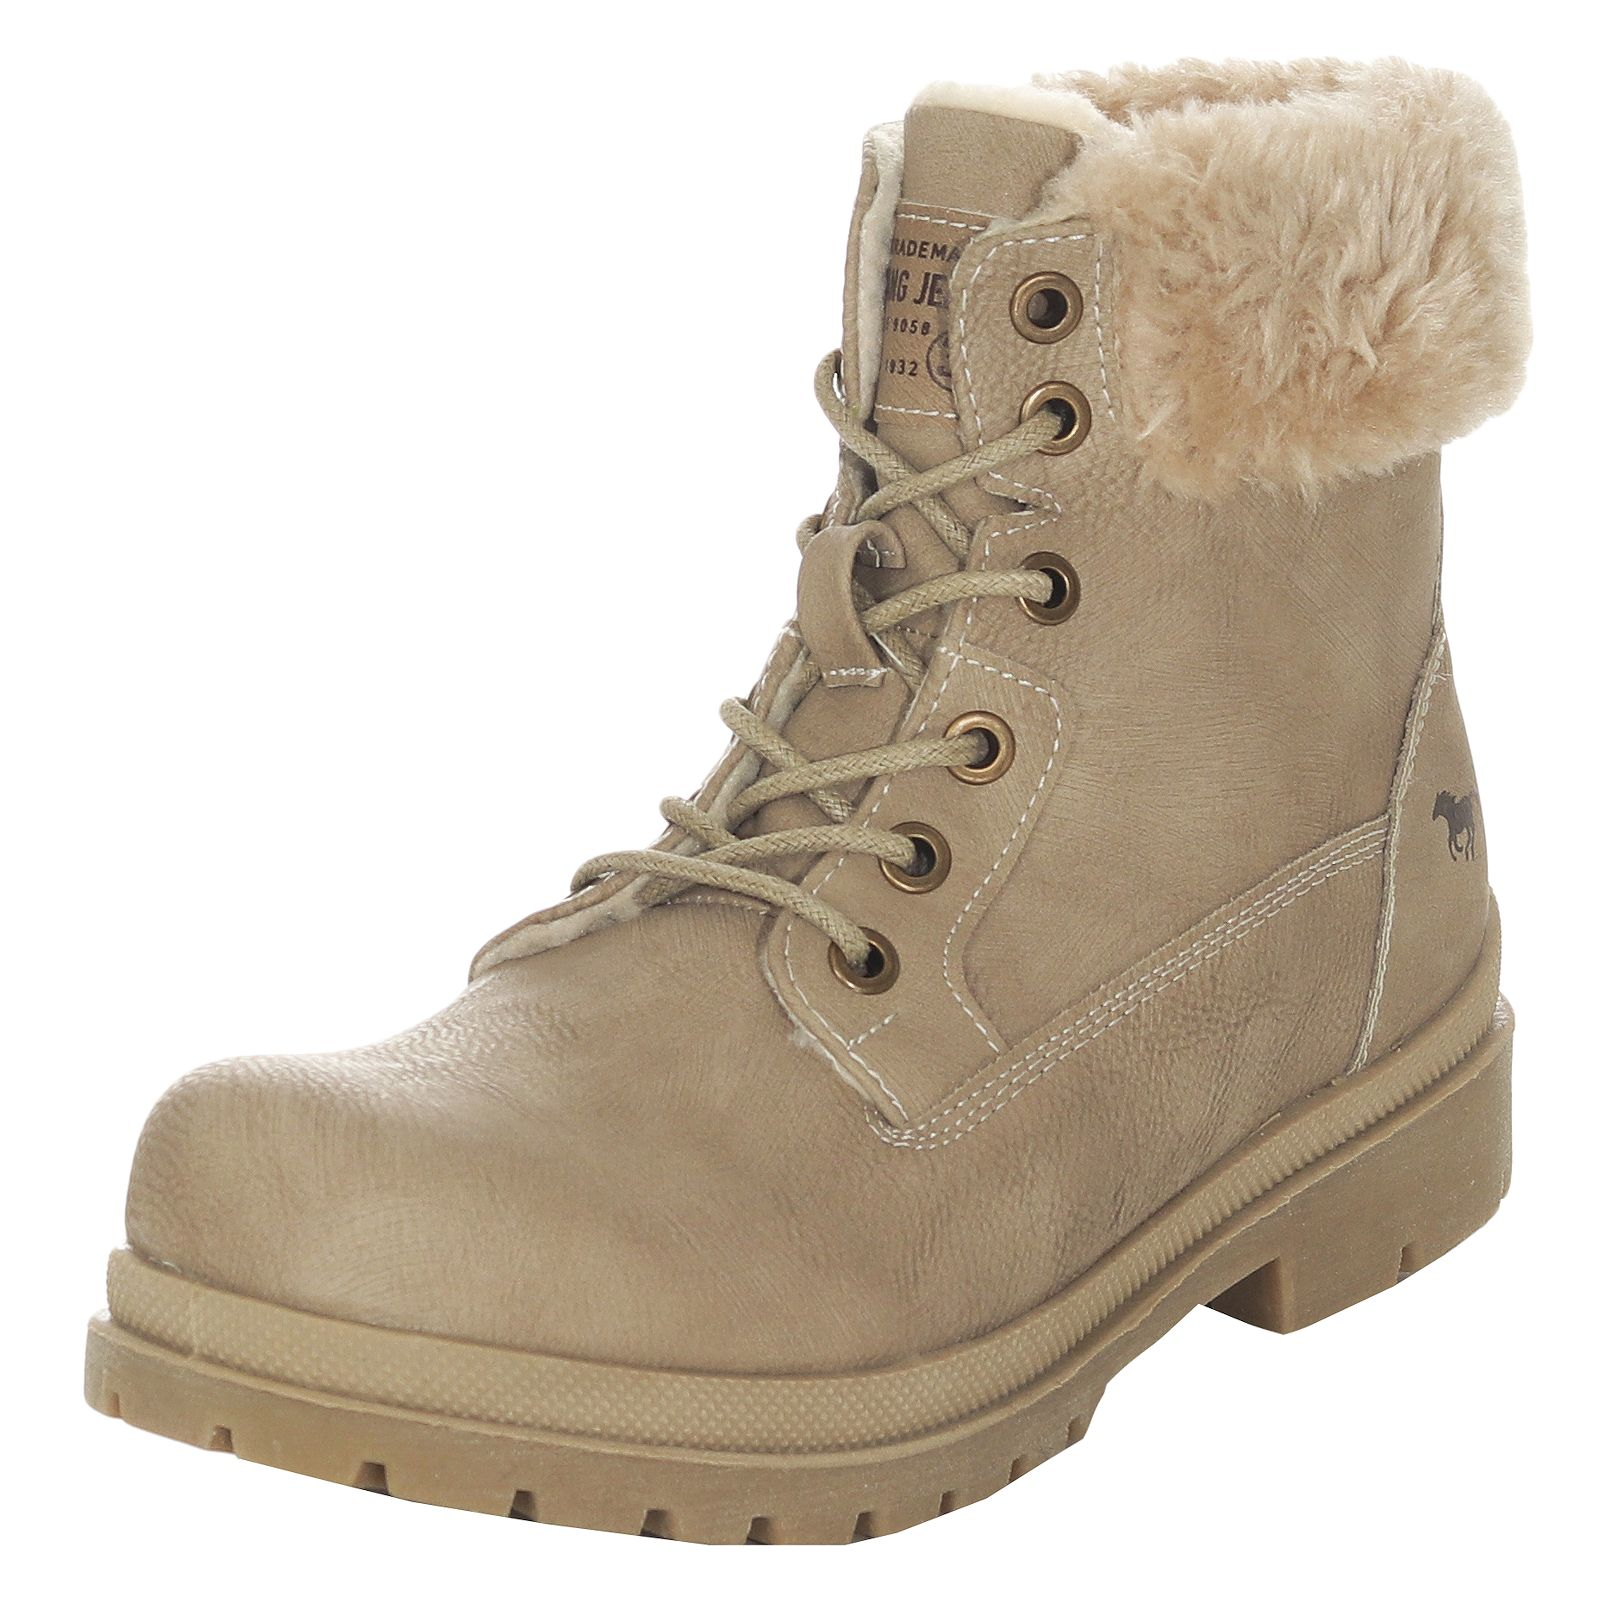 Mustang Damen Winter Schuhe Stiefel Ankle Boots Booties ... 9653e2ce1b